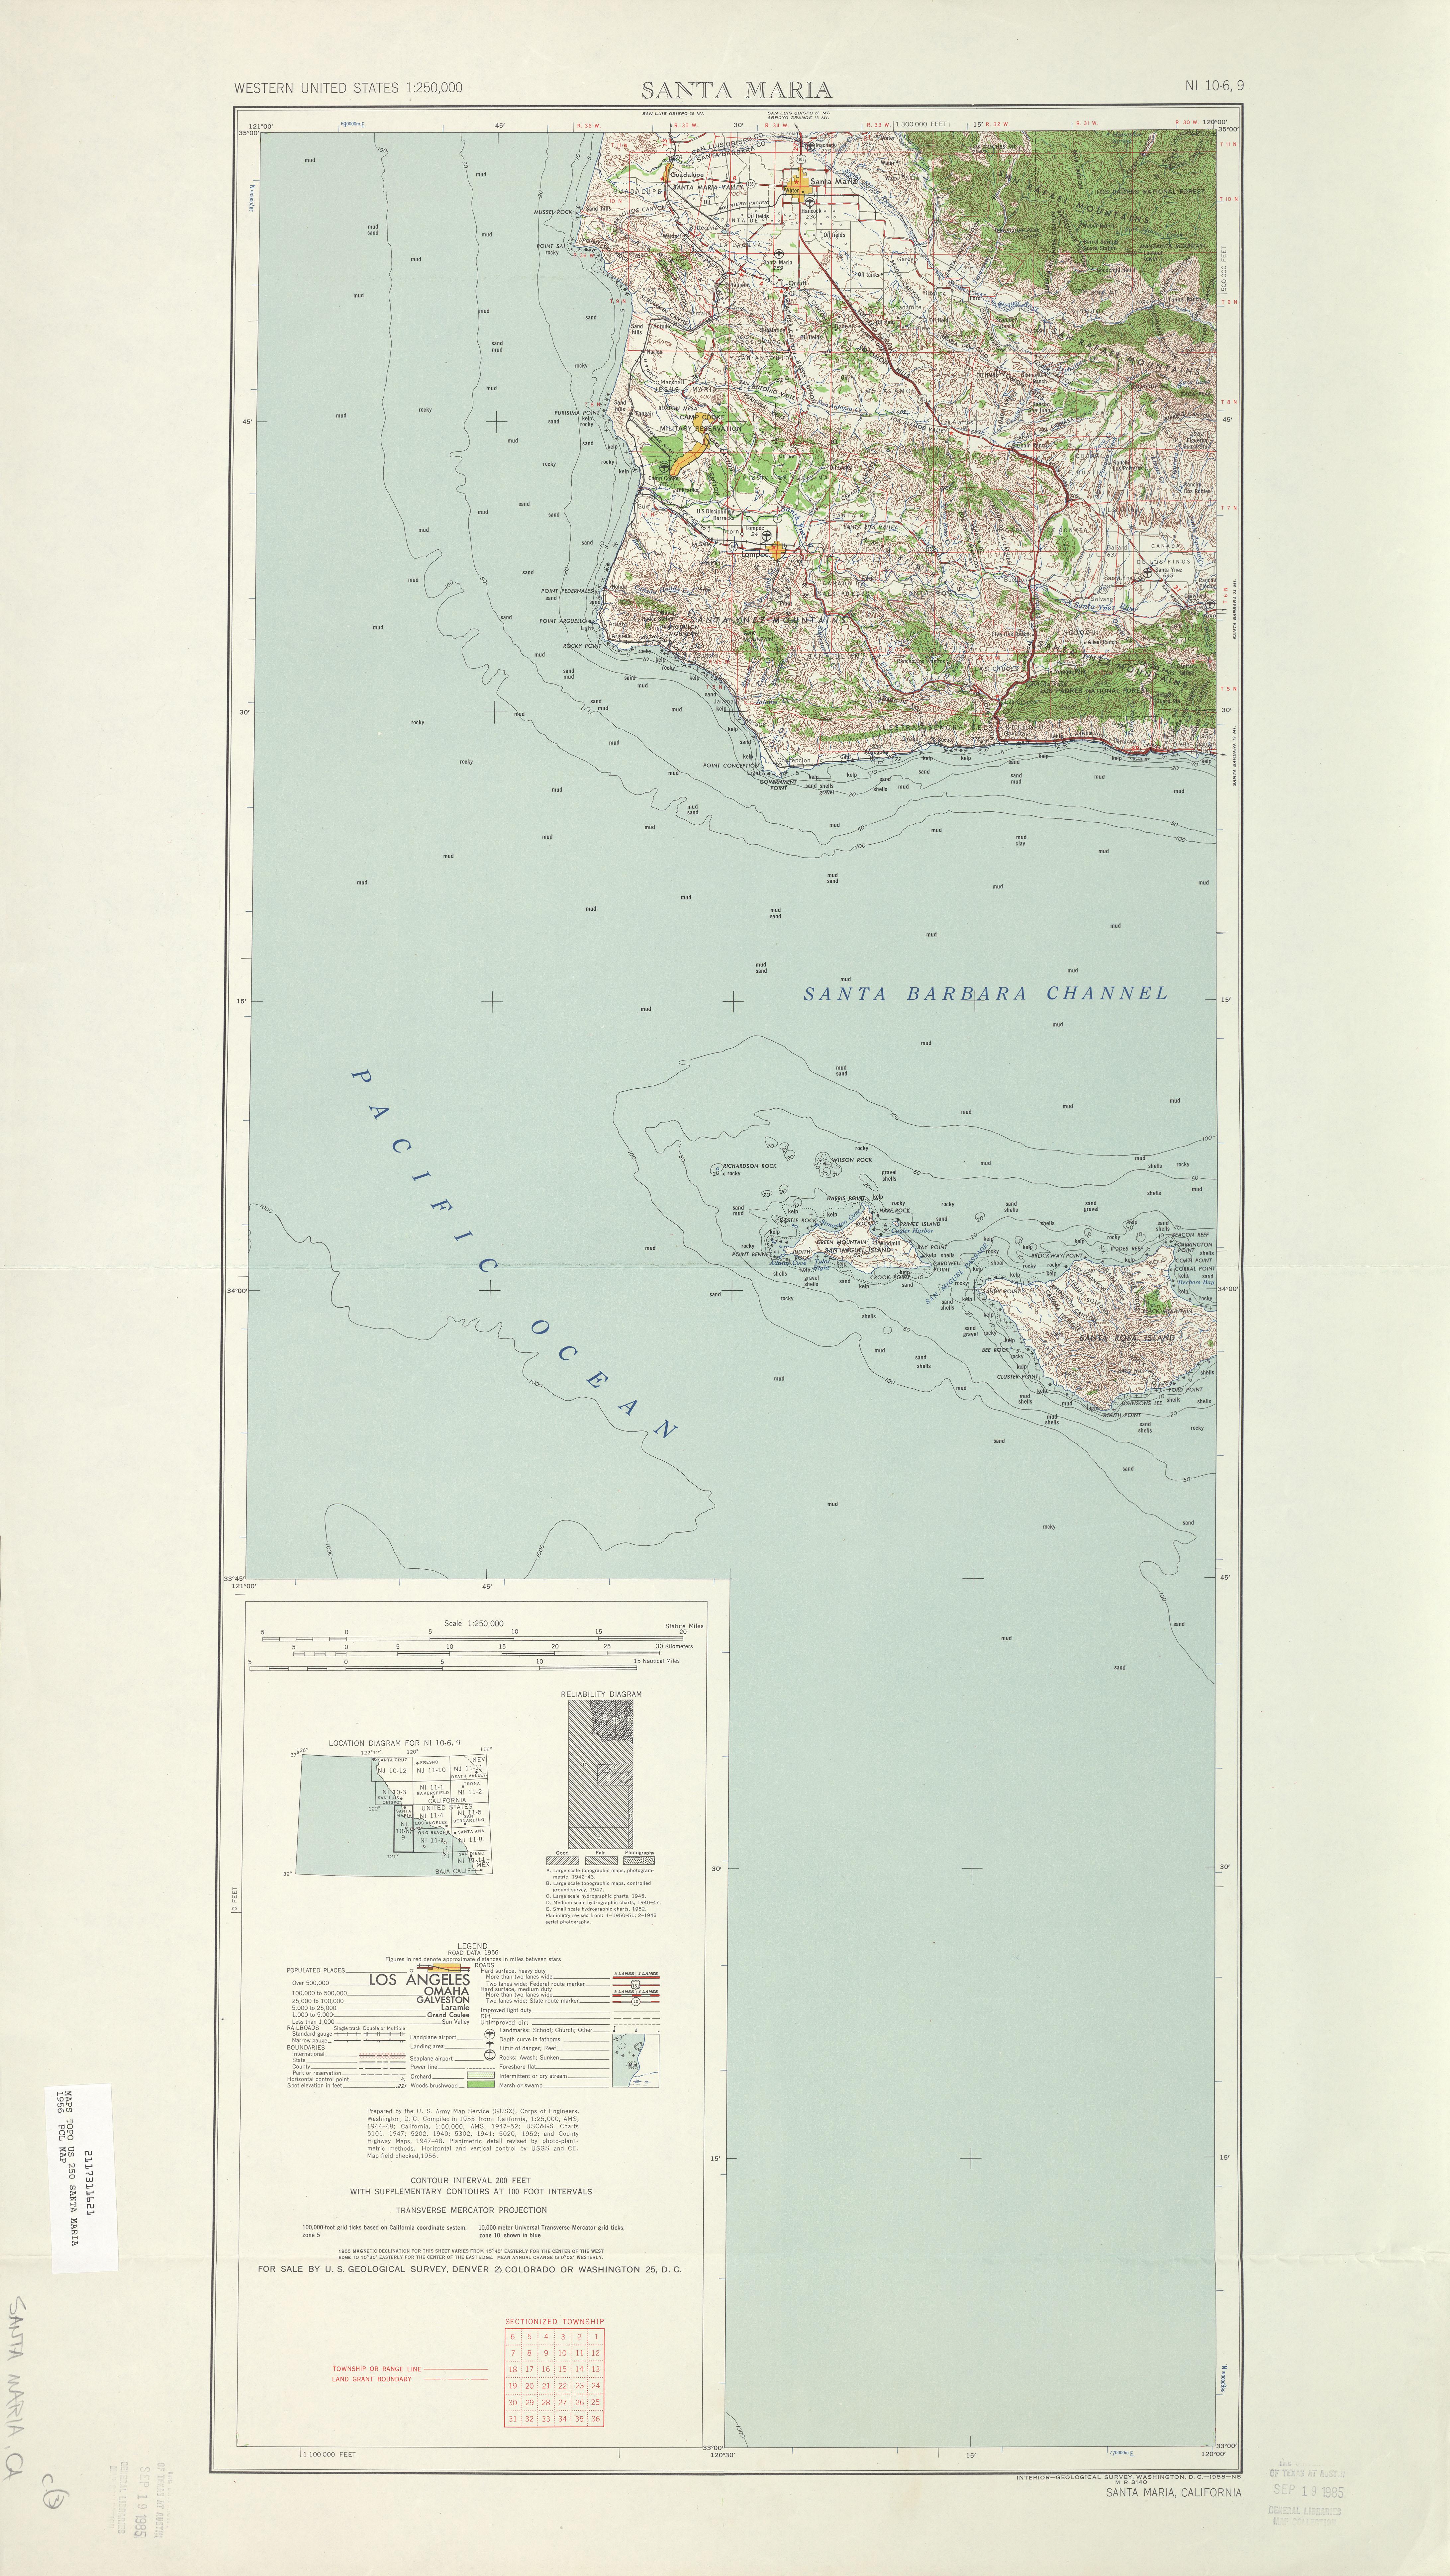 Santa Maria Topographic Map Sheet, United States 1956